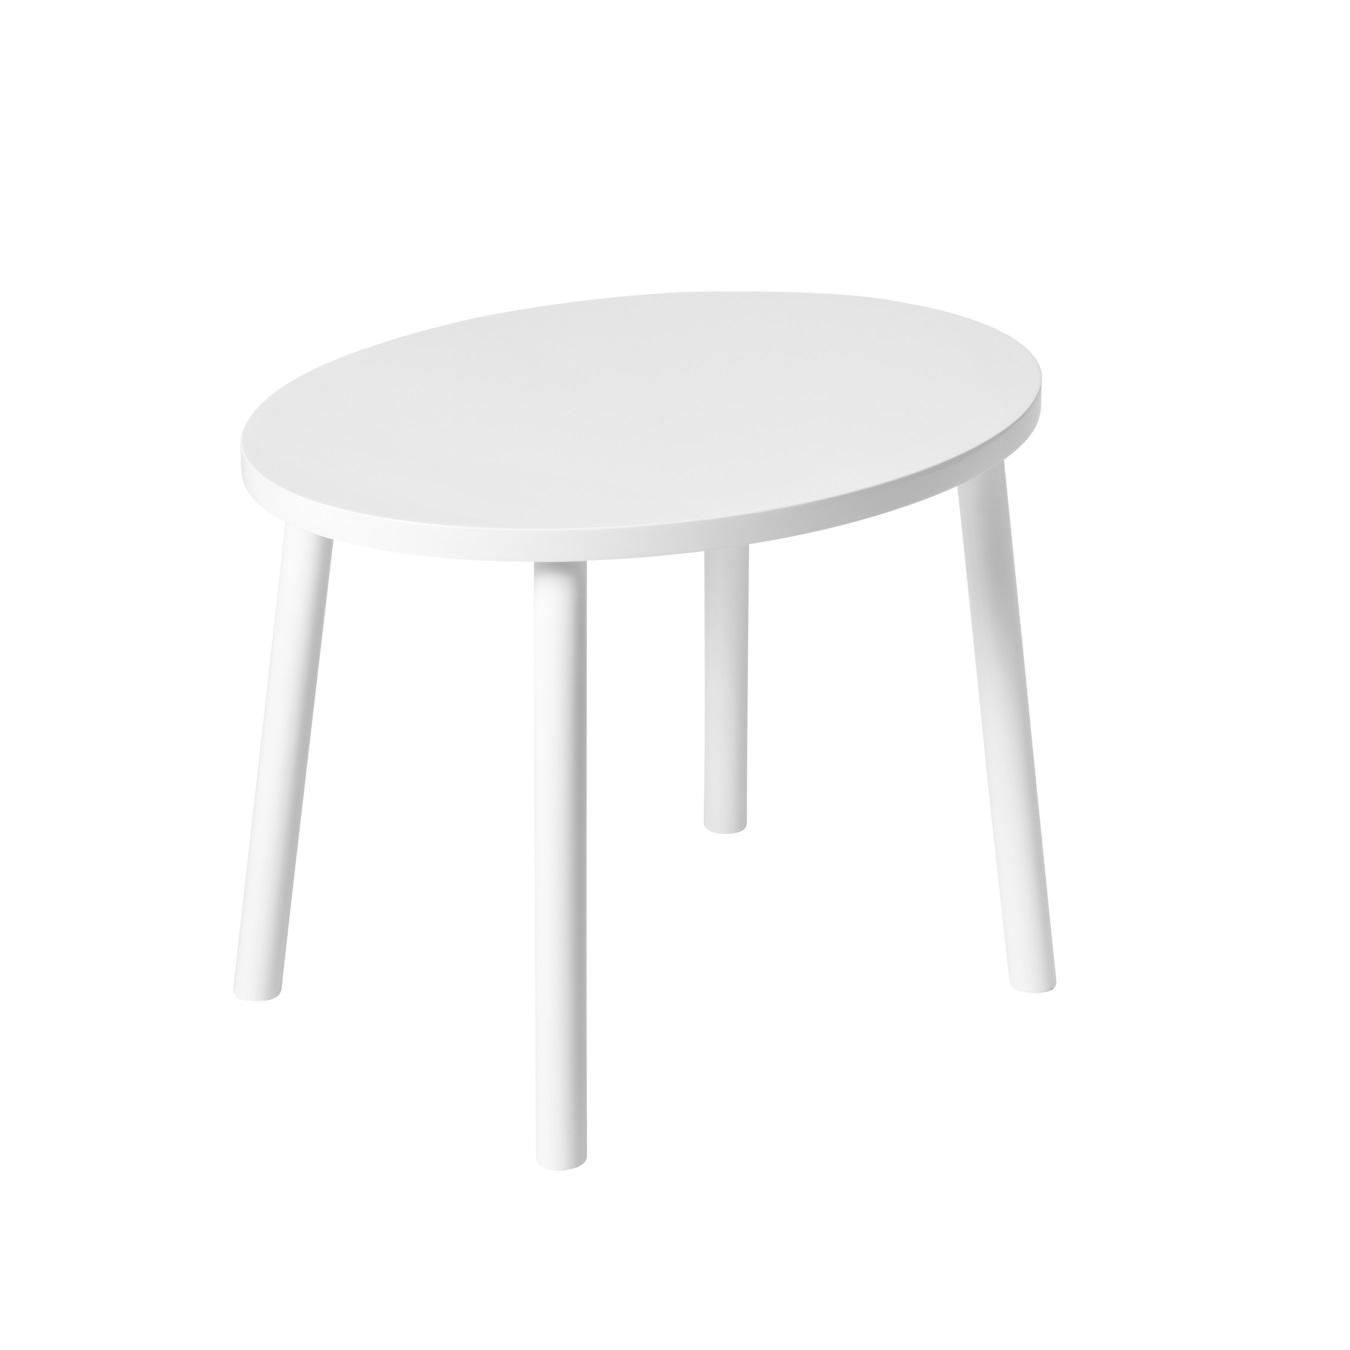 MOUSE TABLE WHITE 2-5 år barnbord, Nofred